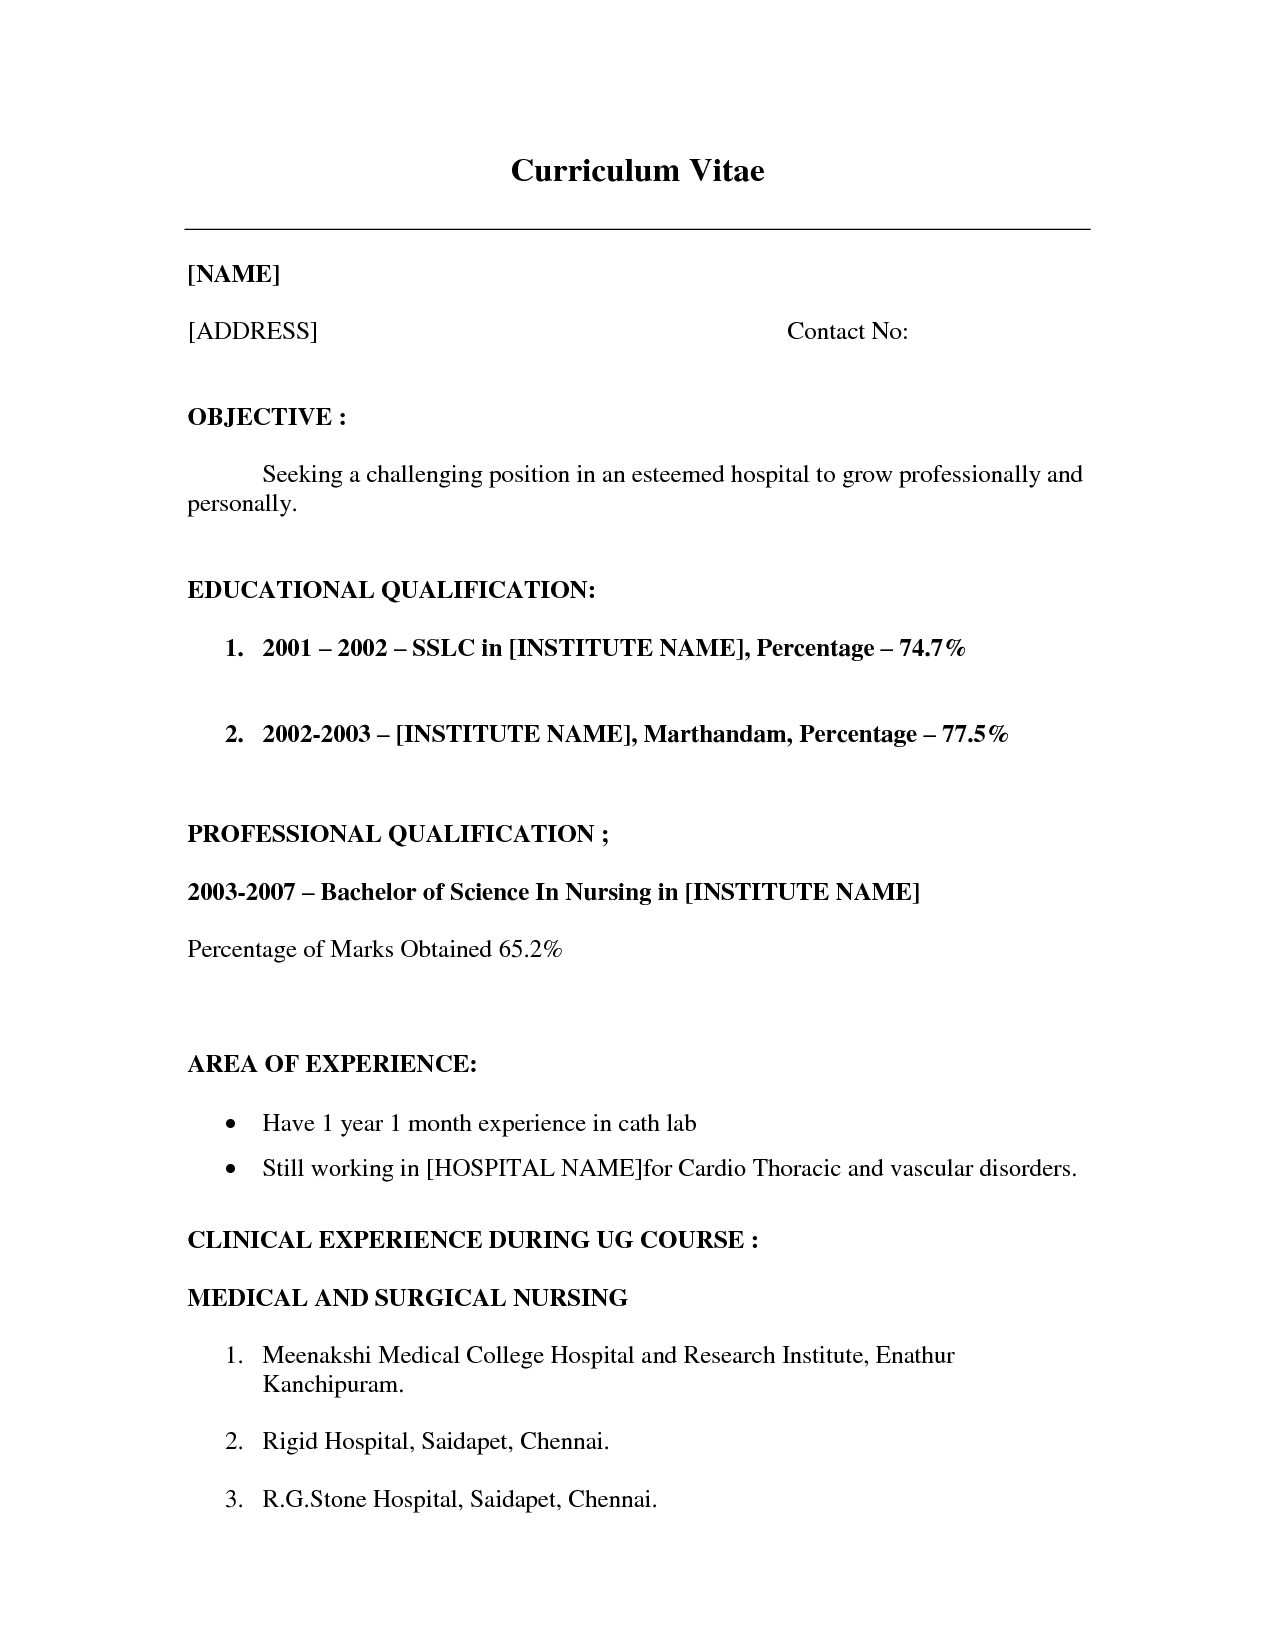 Free Resume Templates No Job Experience - Resume Examples